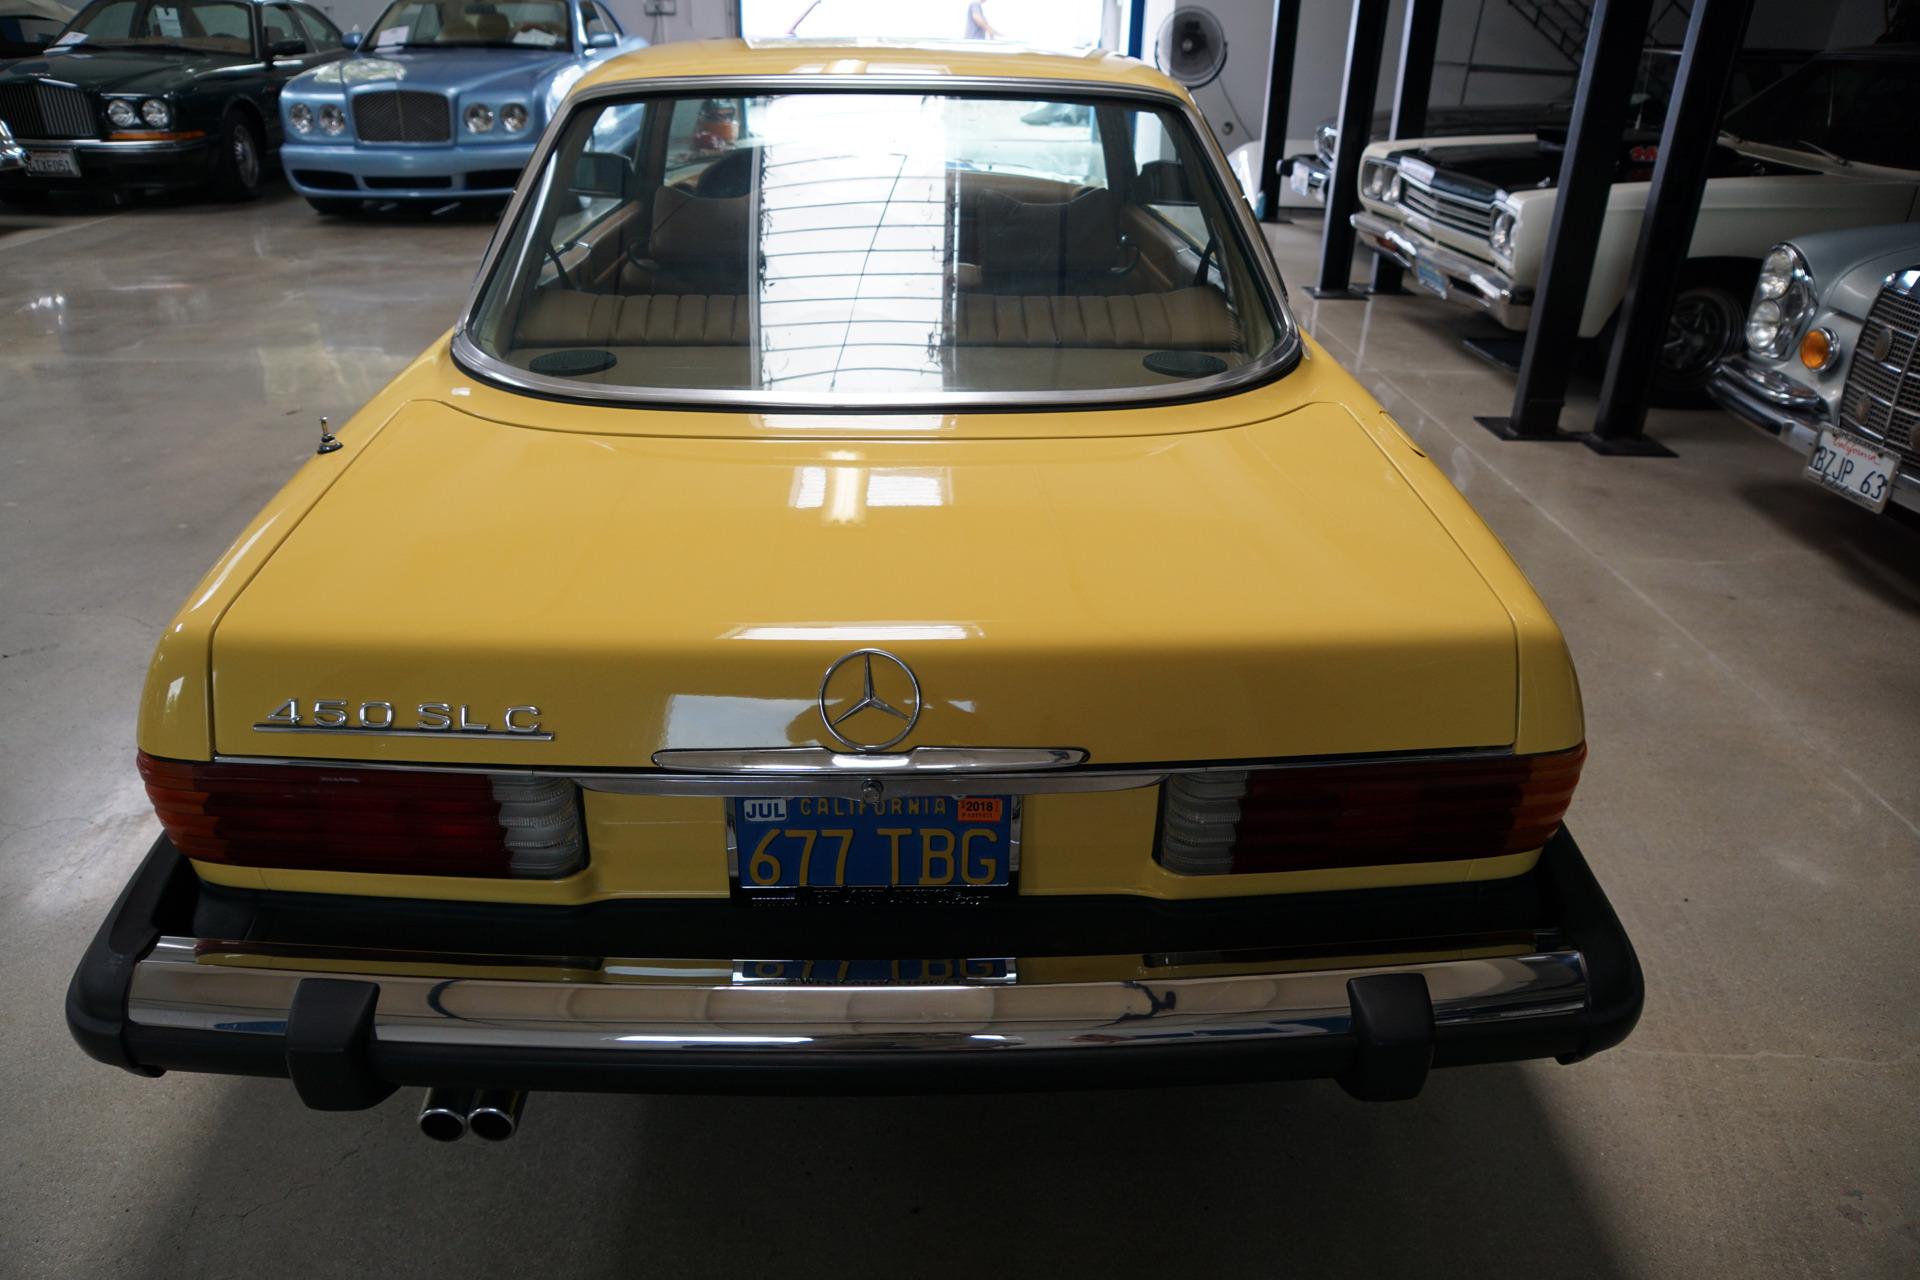 1977 mercedes benz 450slc stock 358 for sale near for Mercedes benz dealer in bakersfield ca